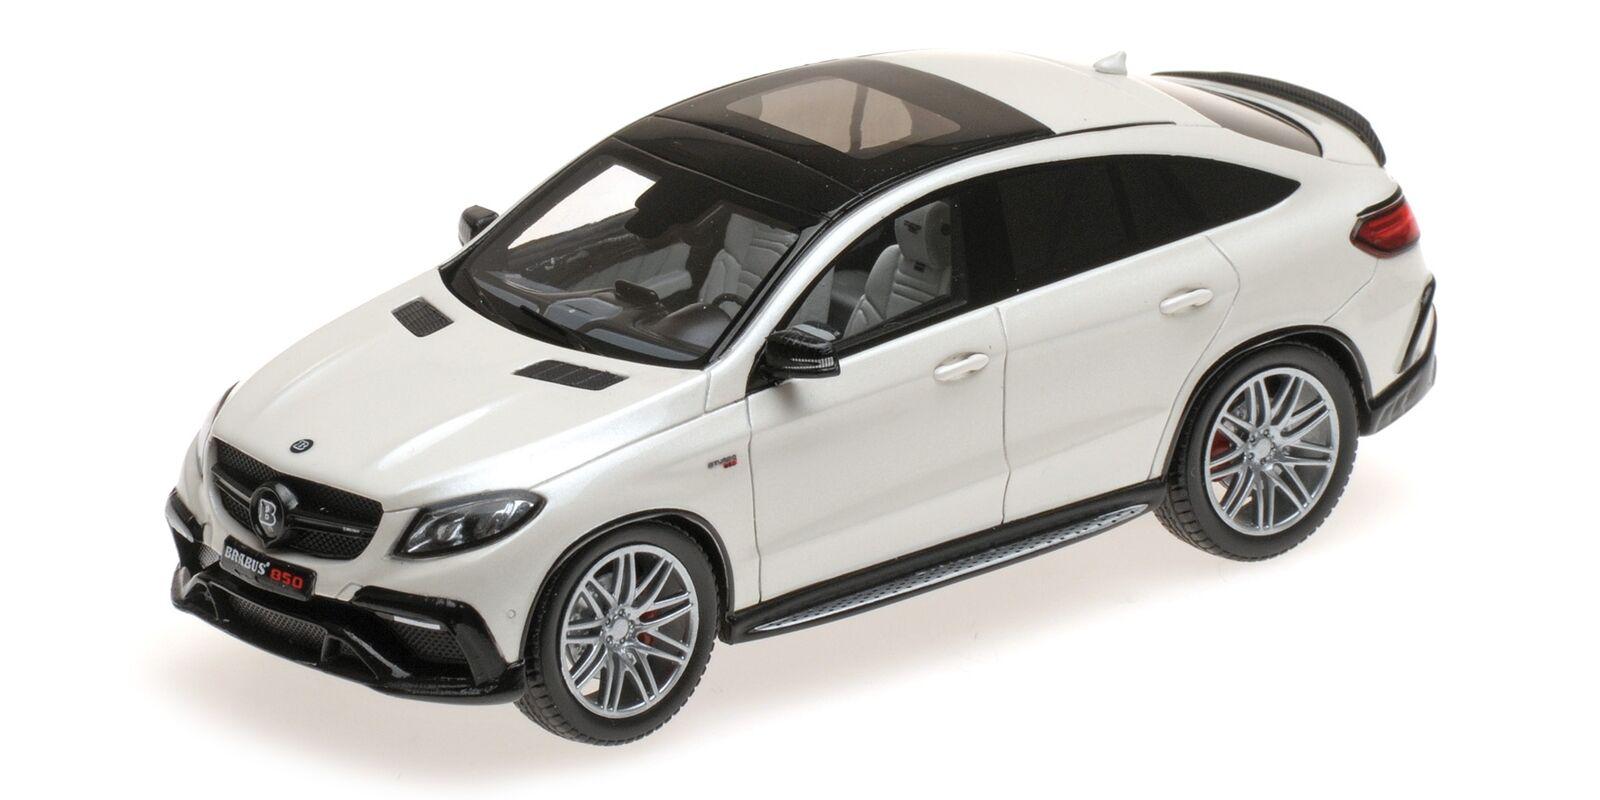 Brabus 850 4X4 Auf Basis Mercedes Benz Gle 63 S 2016 MINICHAMPS 1 43 437034310 M